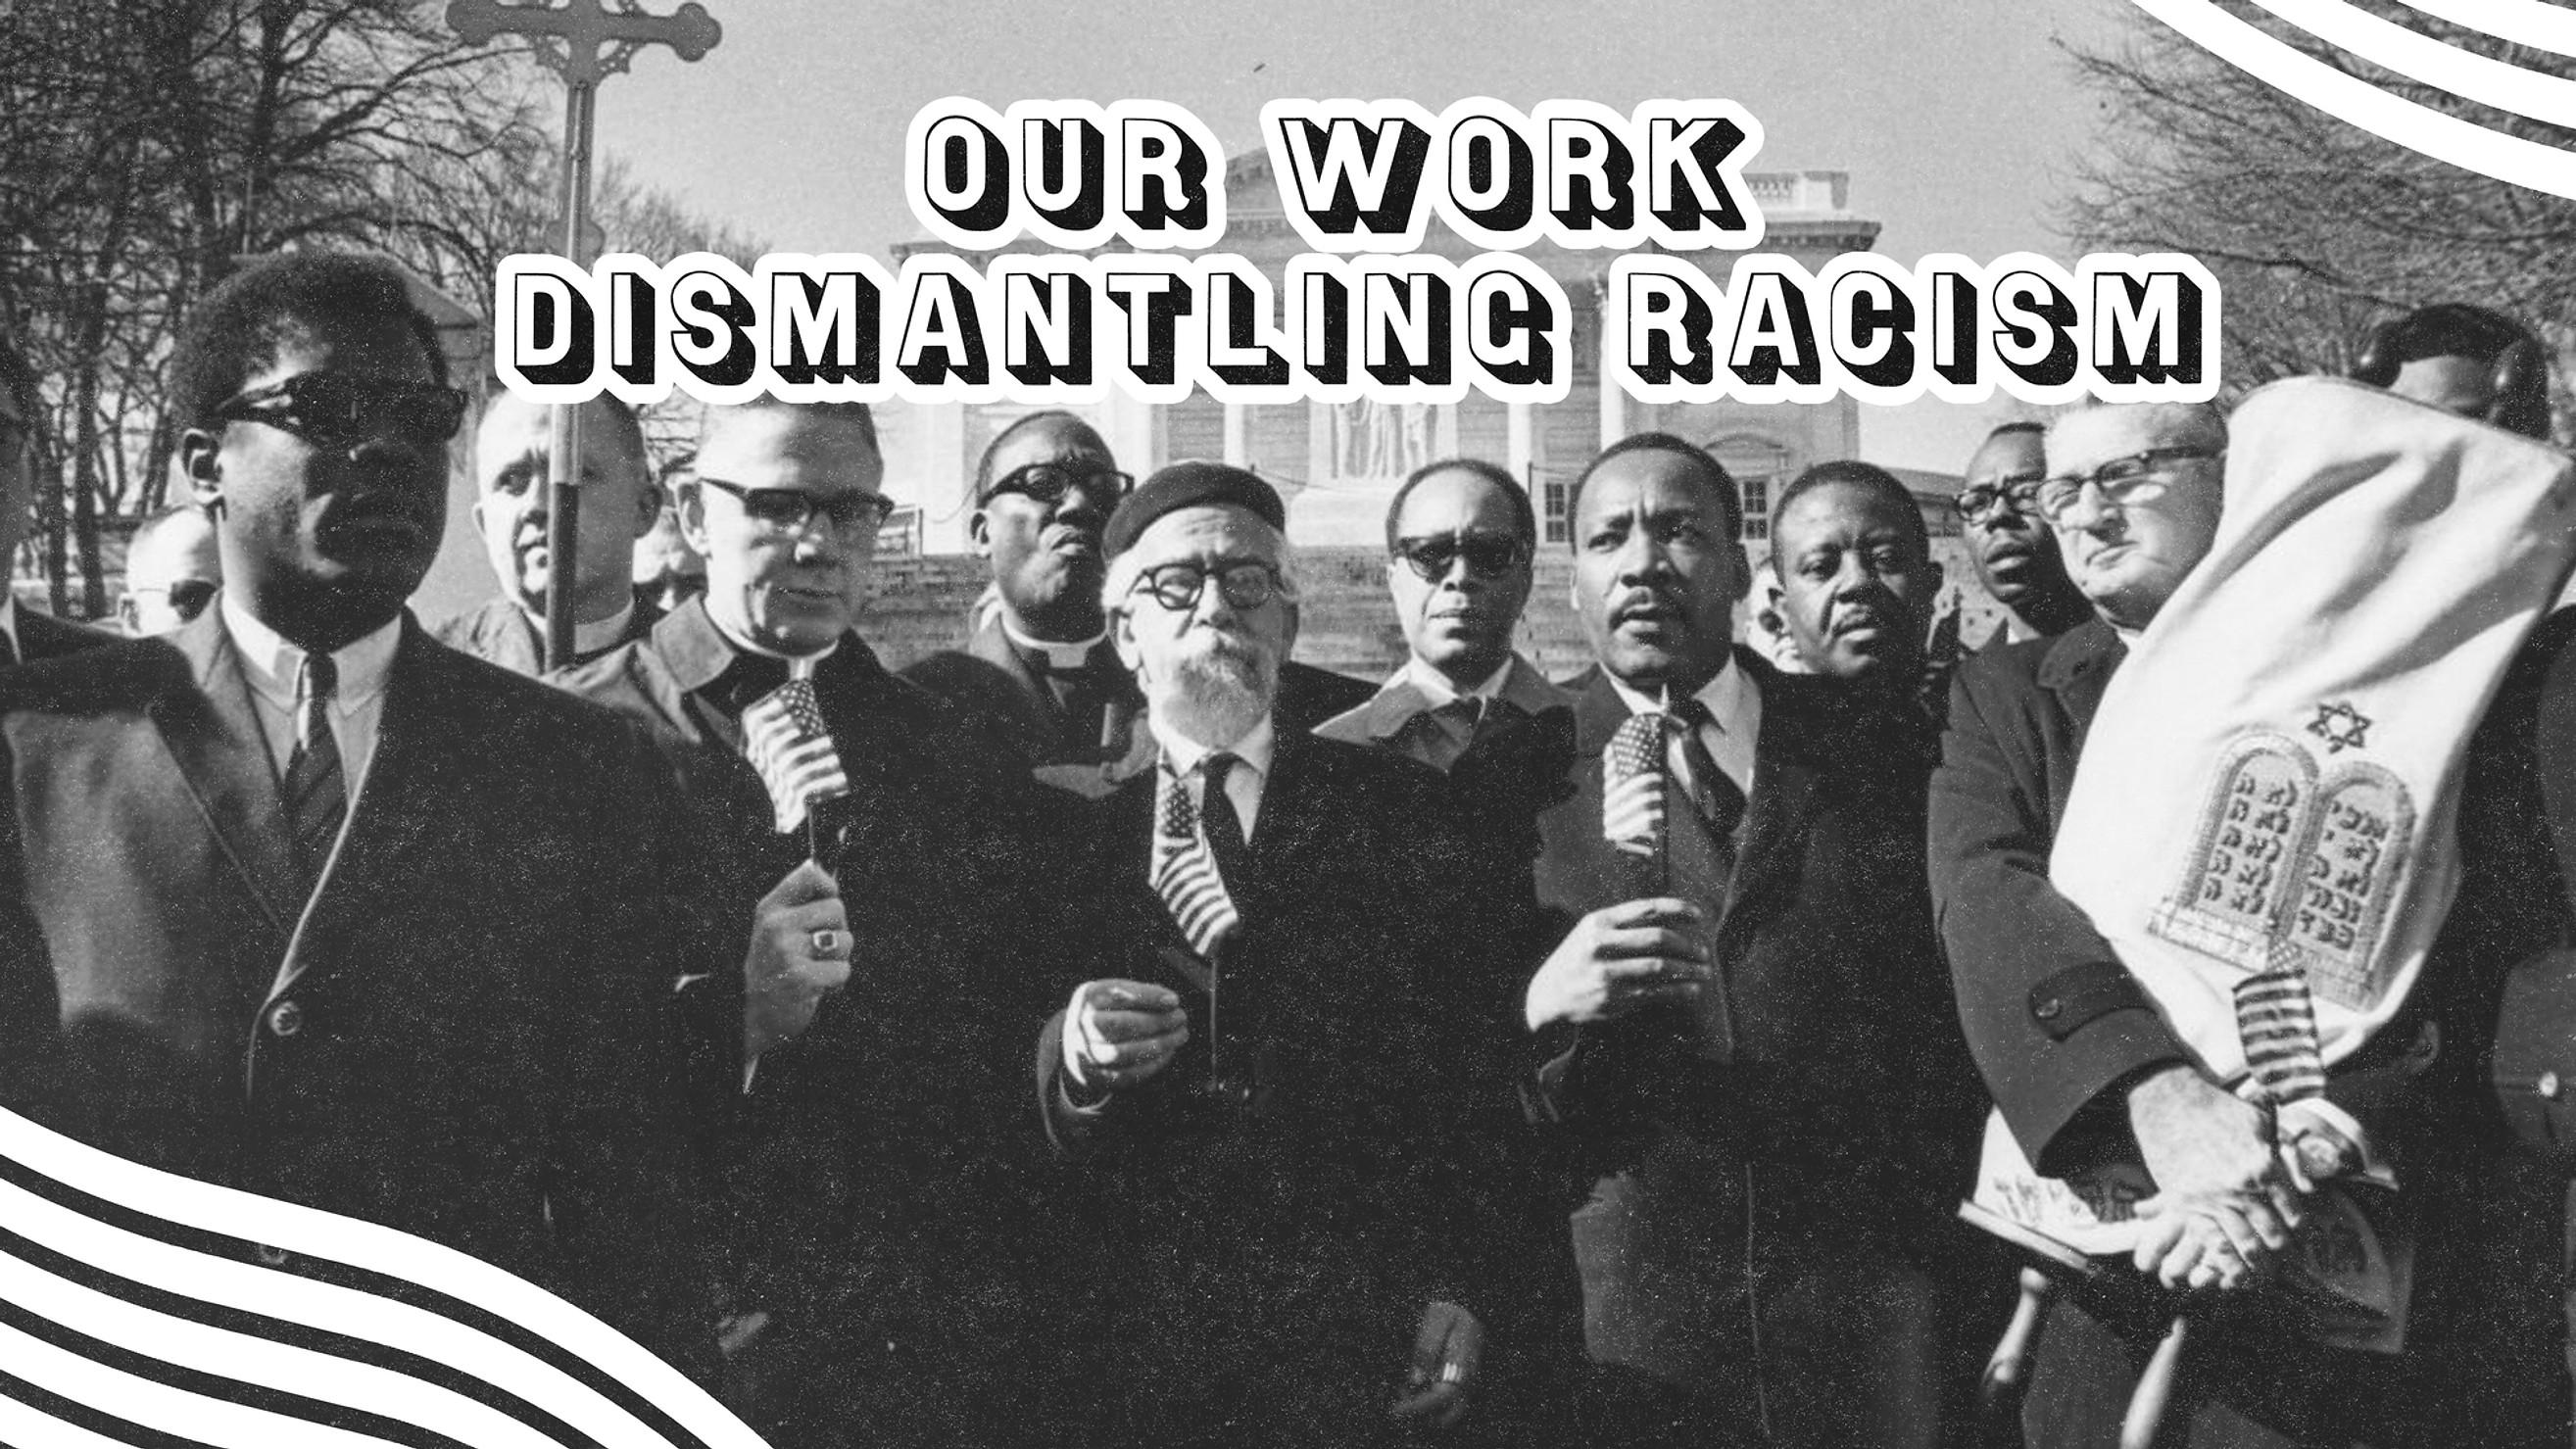 dismantling racism.jpg